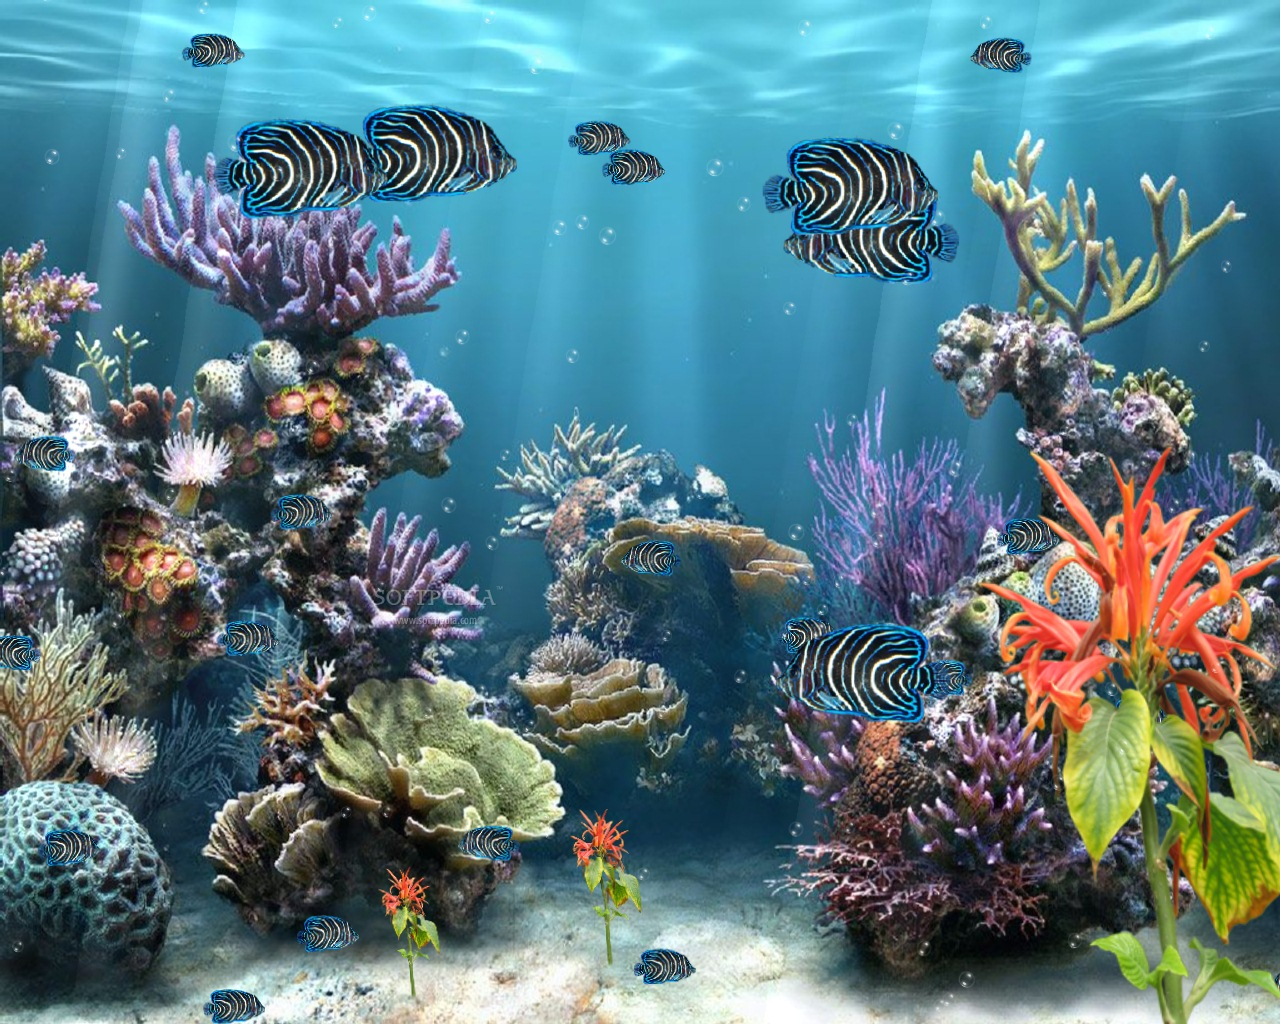 Fish aquarium screensaver - Water Aquariums Fish Coral Reef Deep Sea Life Tropical Fish Fish